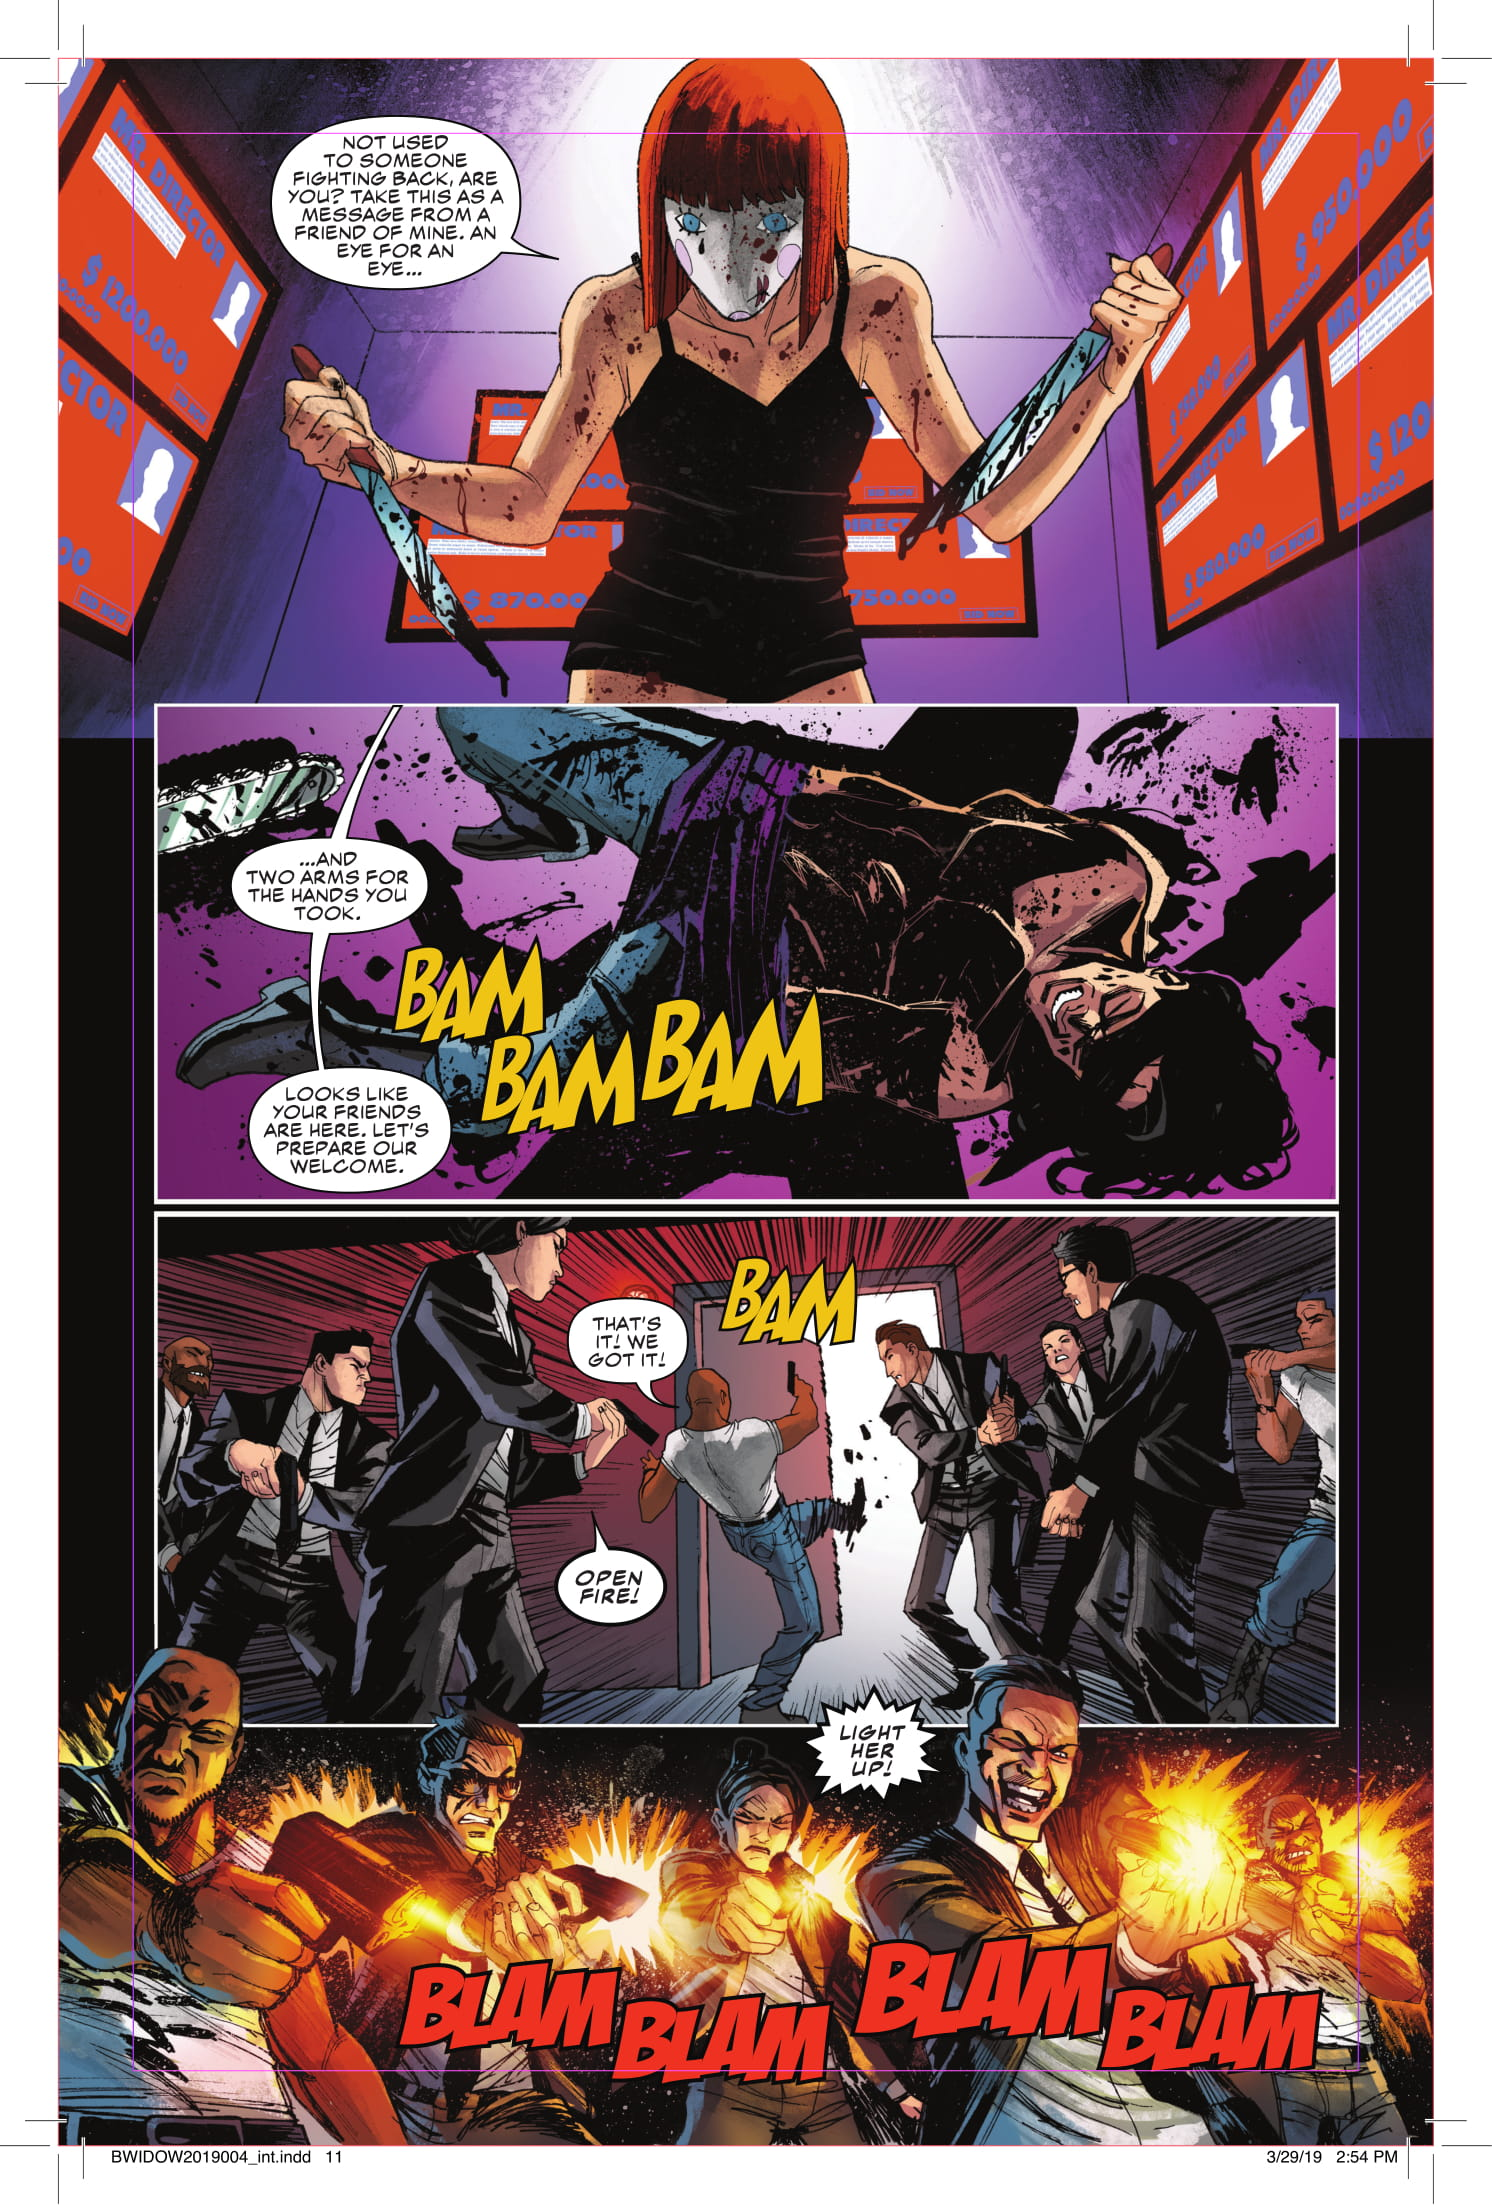 Black Widow #4 page 2